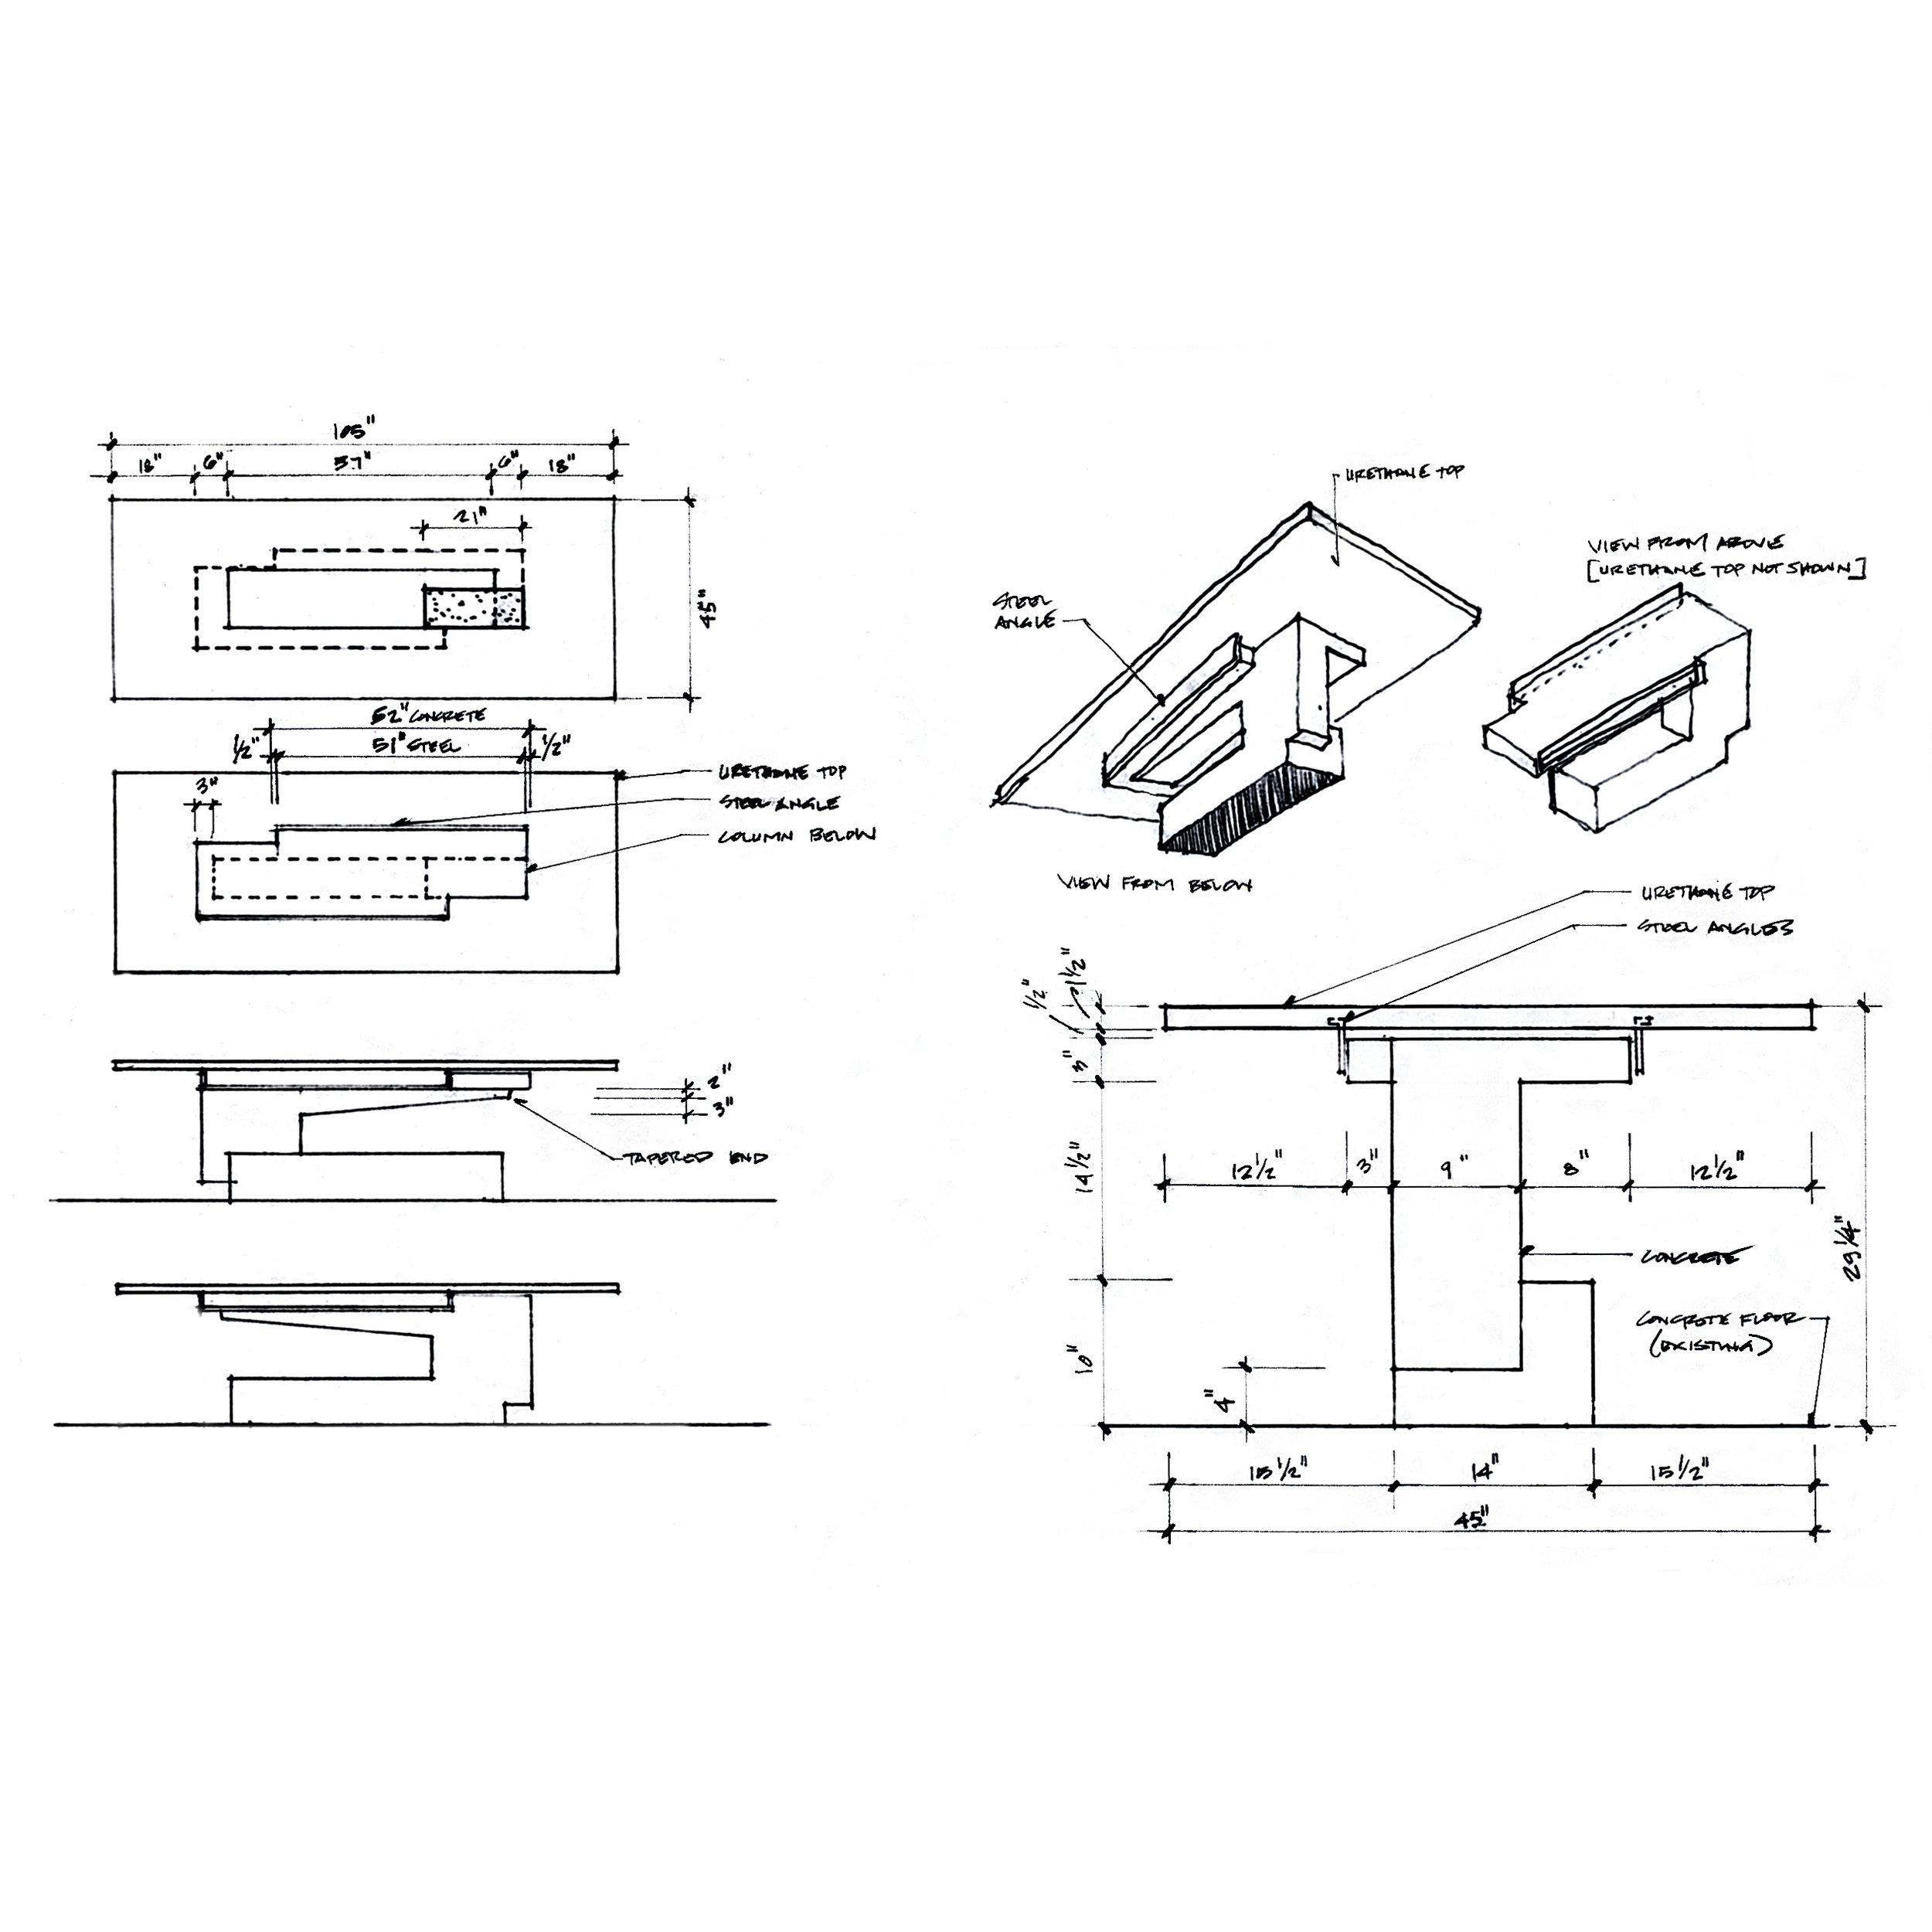 LVY-Concrete-Dining-Table1-070826.jpg